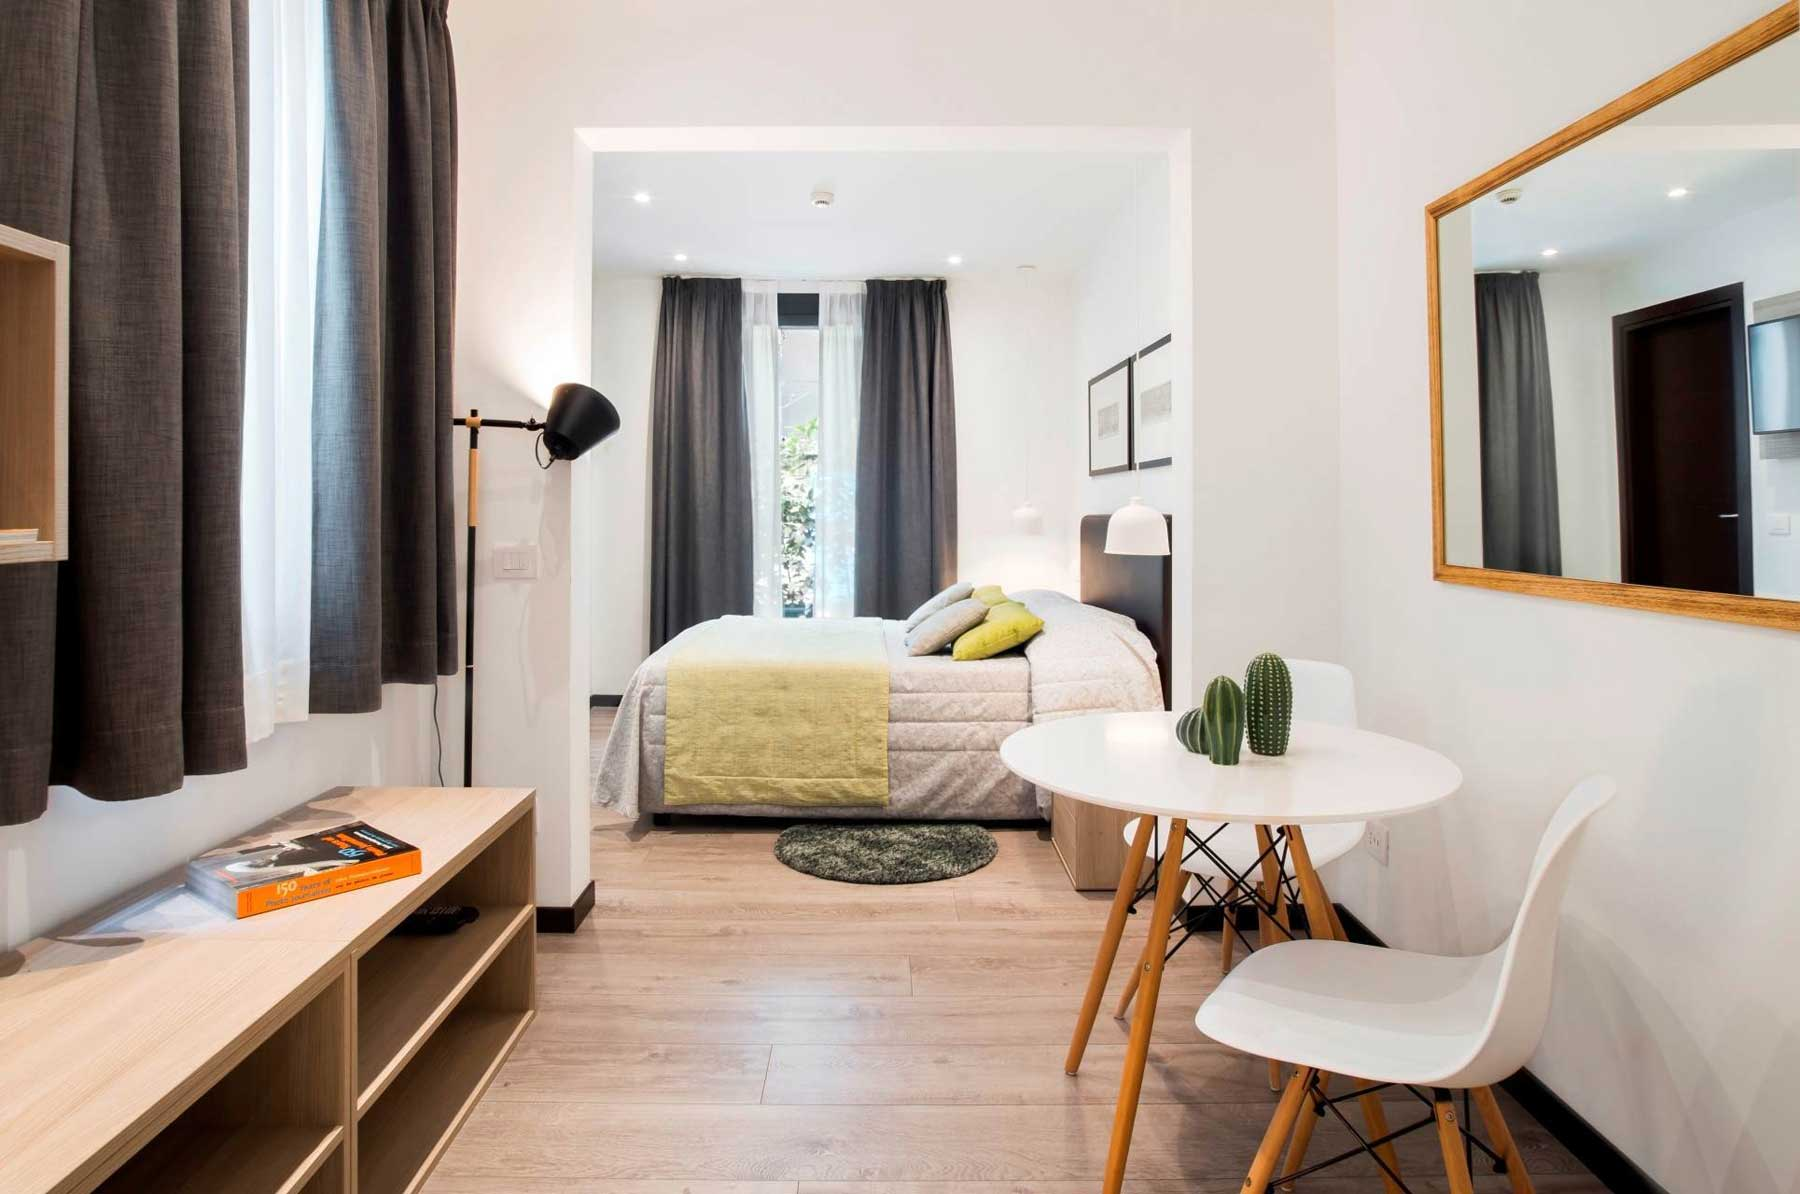 Hotel Bernina Milan Italie (Via Napo Torriani 27): Chambre supérieure